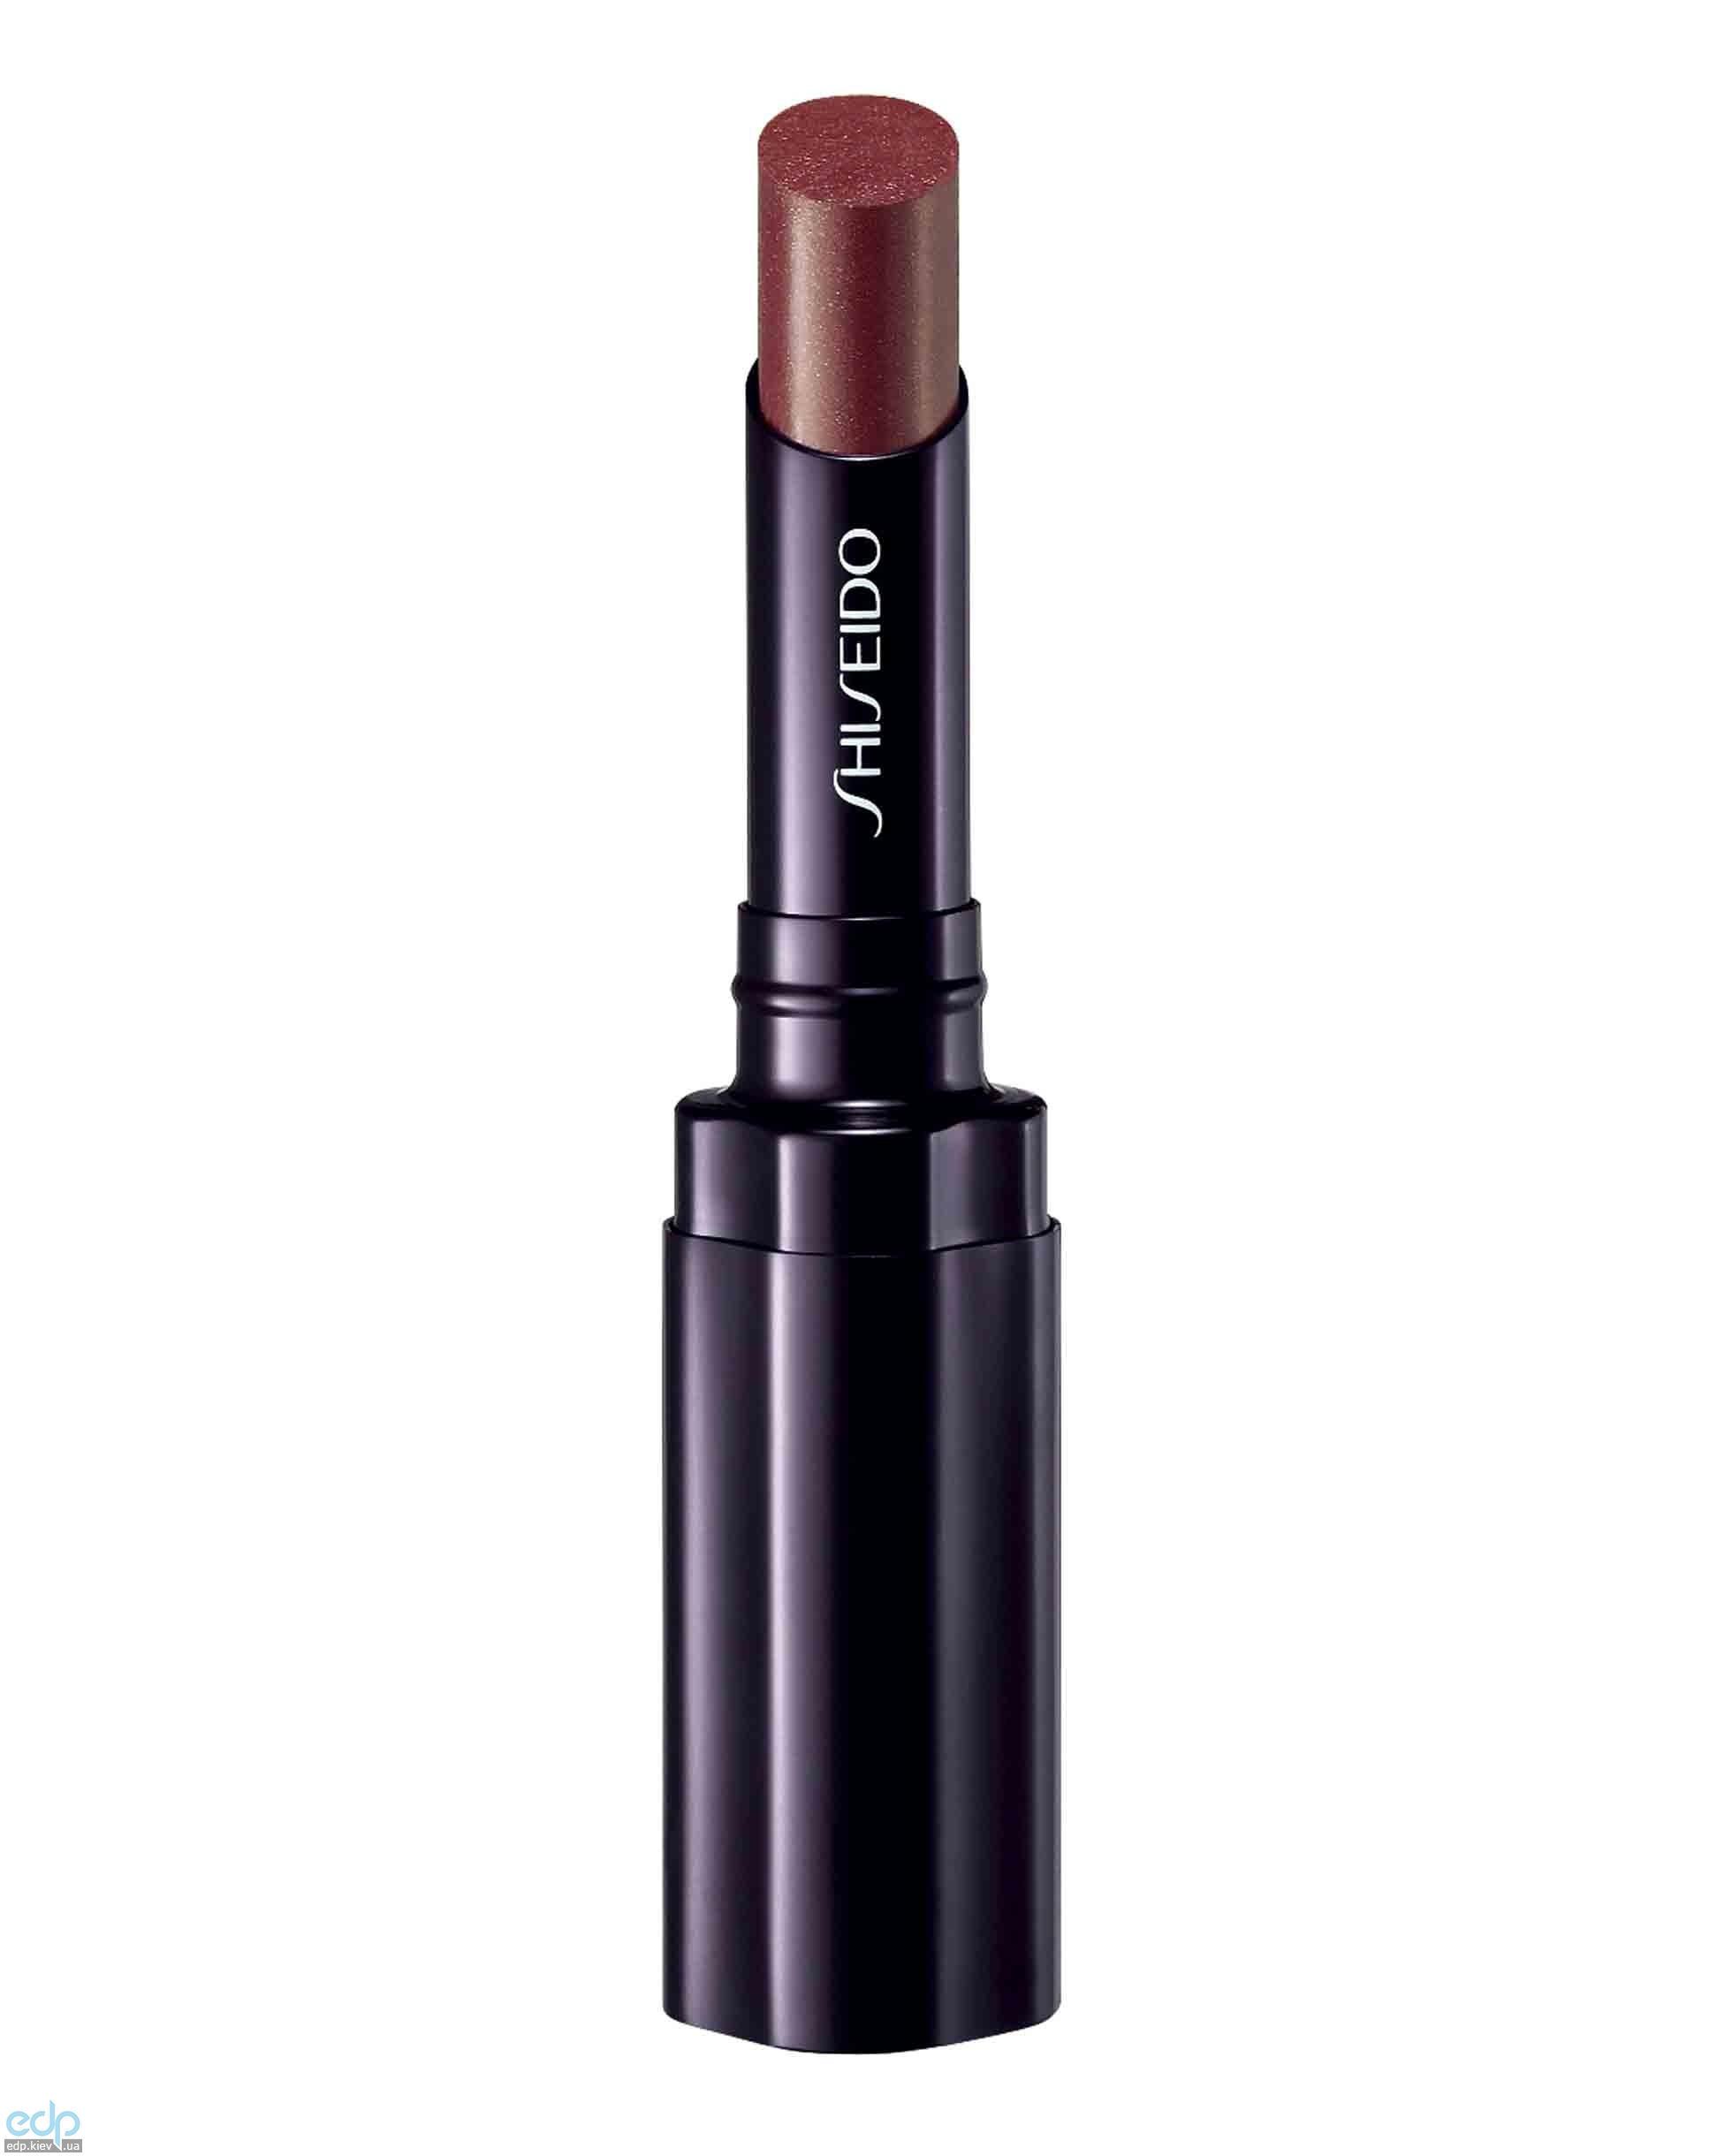 Shiseido - Помада для губ с мерцающим эффектом Shimmering Rouge Discretion № RD 601 - 2.2 g